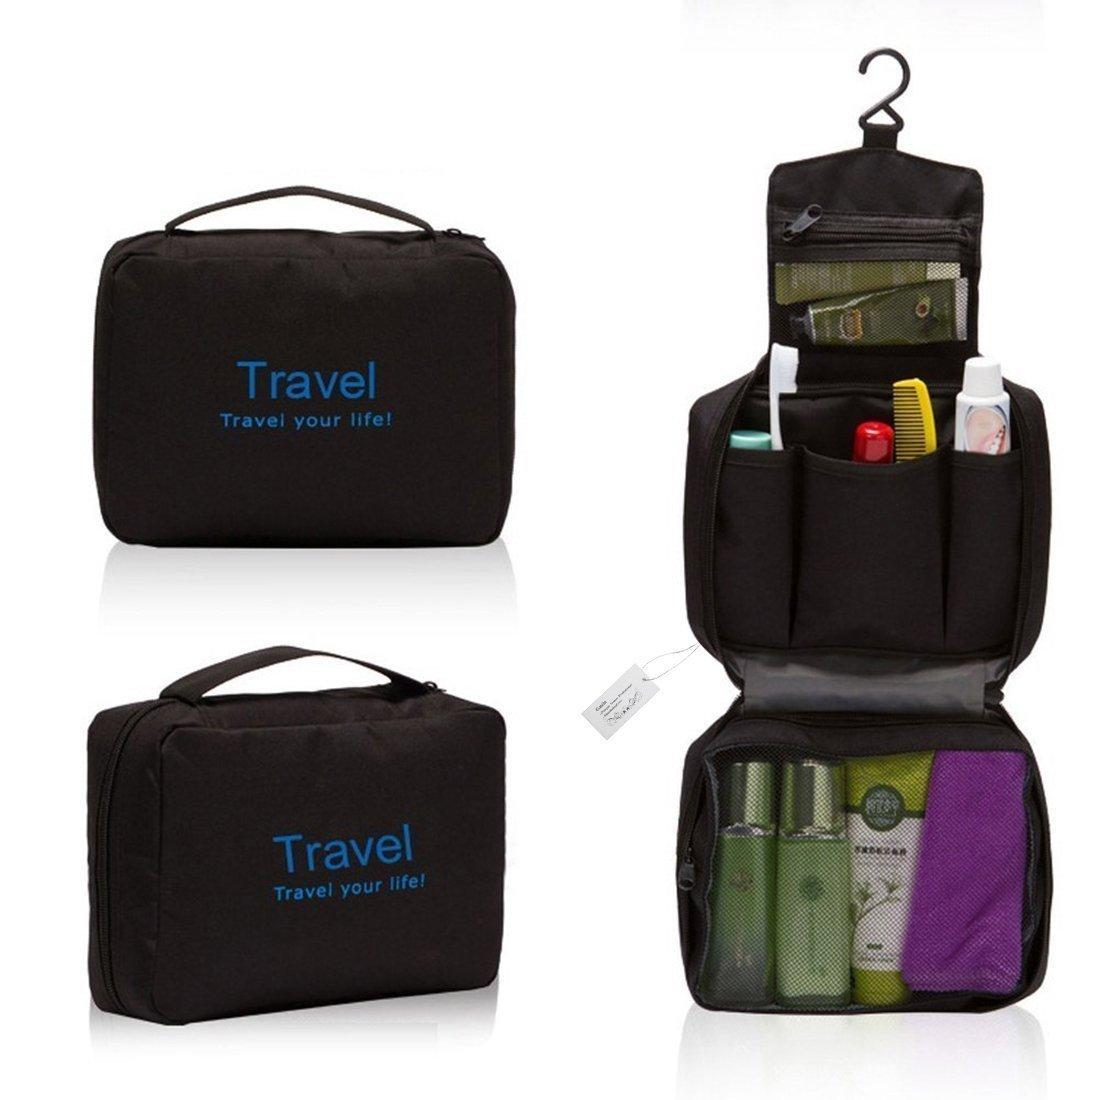 Gmin Brand Men Women Practical Waterproof Nylon Wash Bag, Hanging Wash Bag, Cosmetic Makeup Case Foldable Organizer Bag, Multifunctional Wash Bag for Travel & Camping (Black)